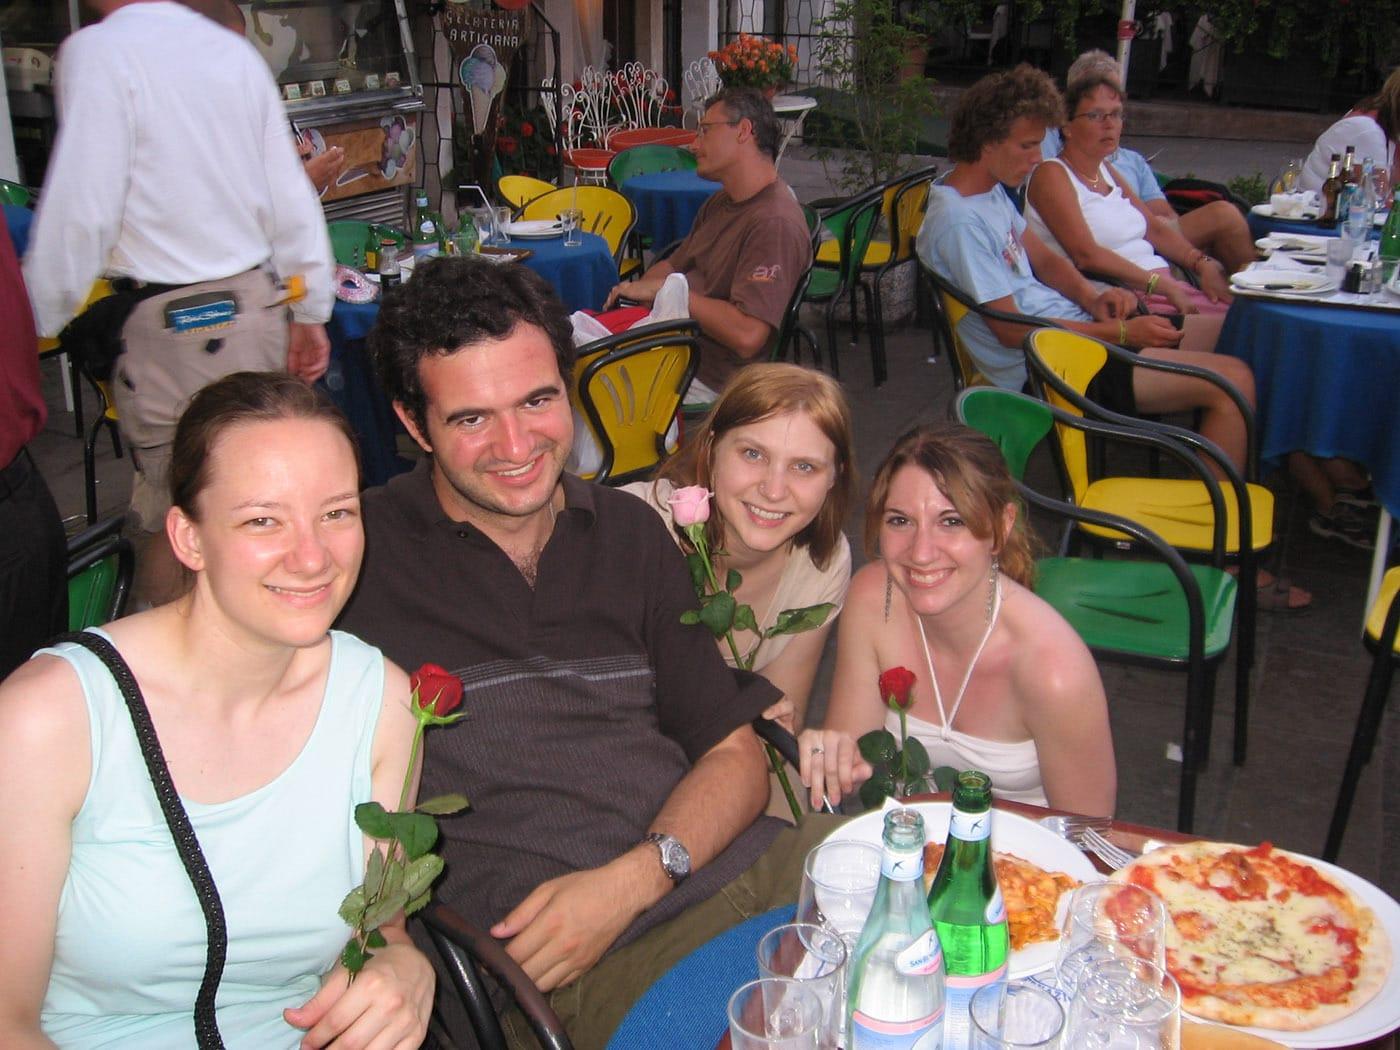 Joe treats his ladies to roses in Venice, Italy